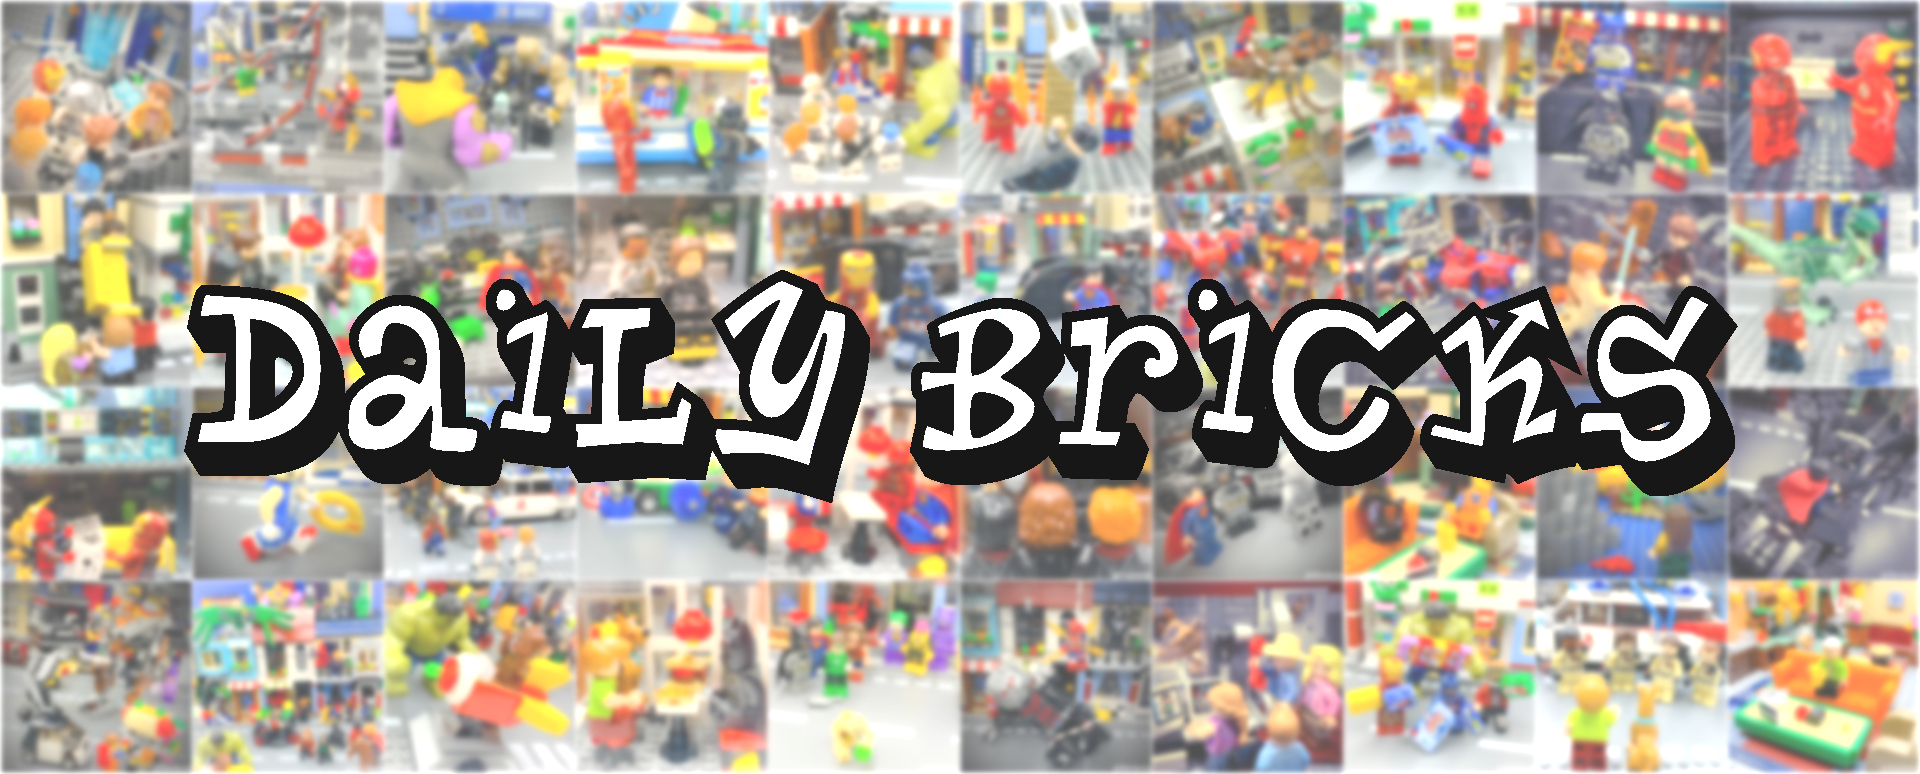 Daily Bricks